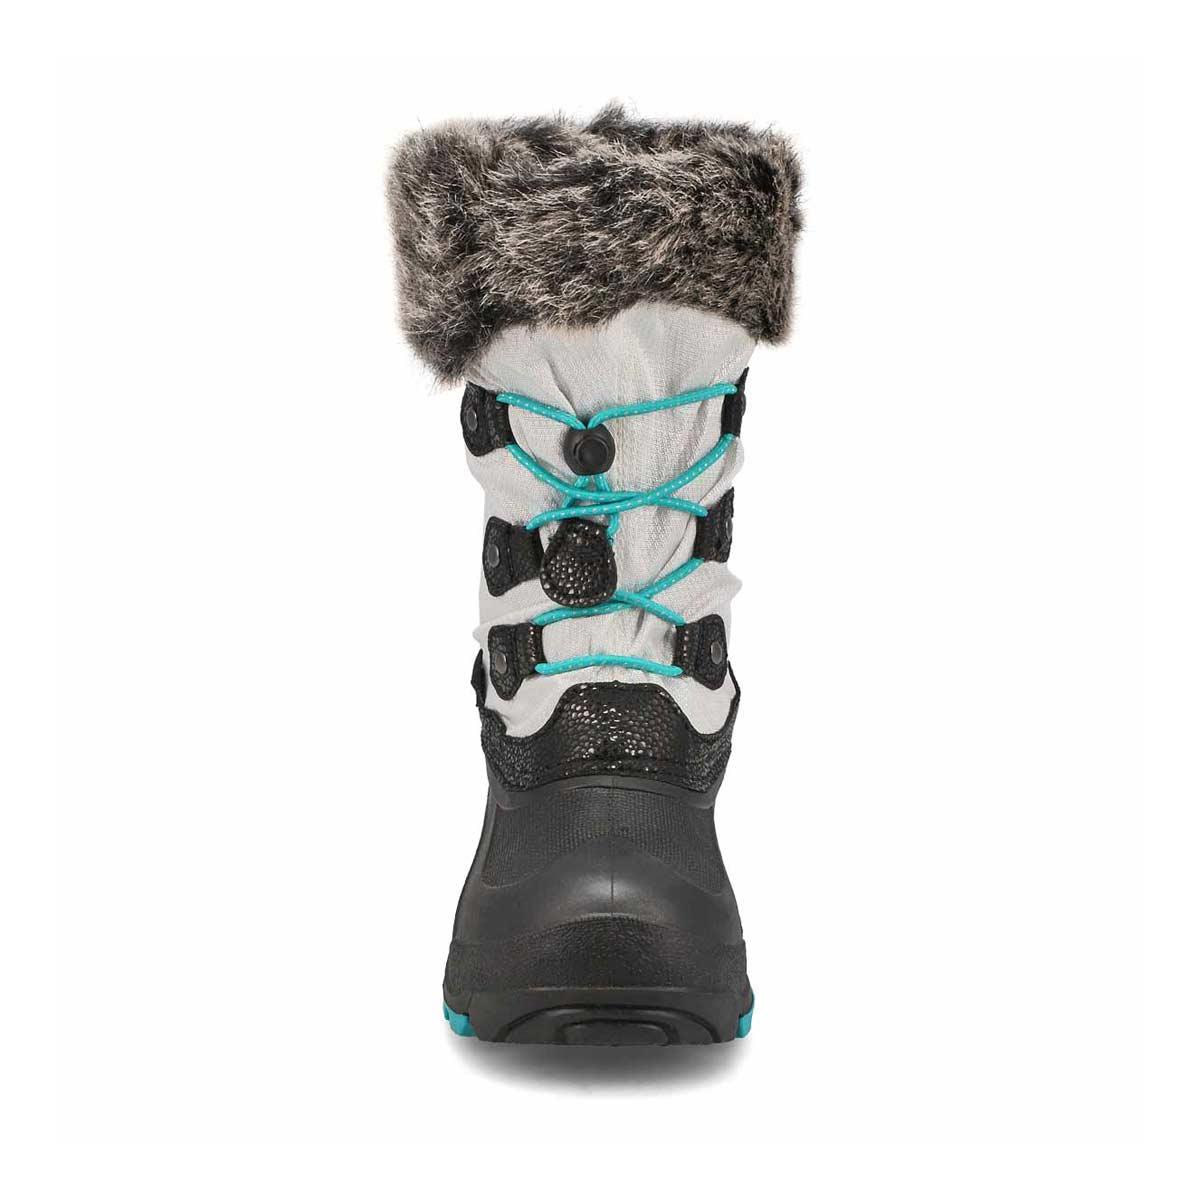 Grls Powdery2 white wtpf winter boot